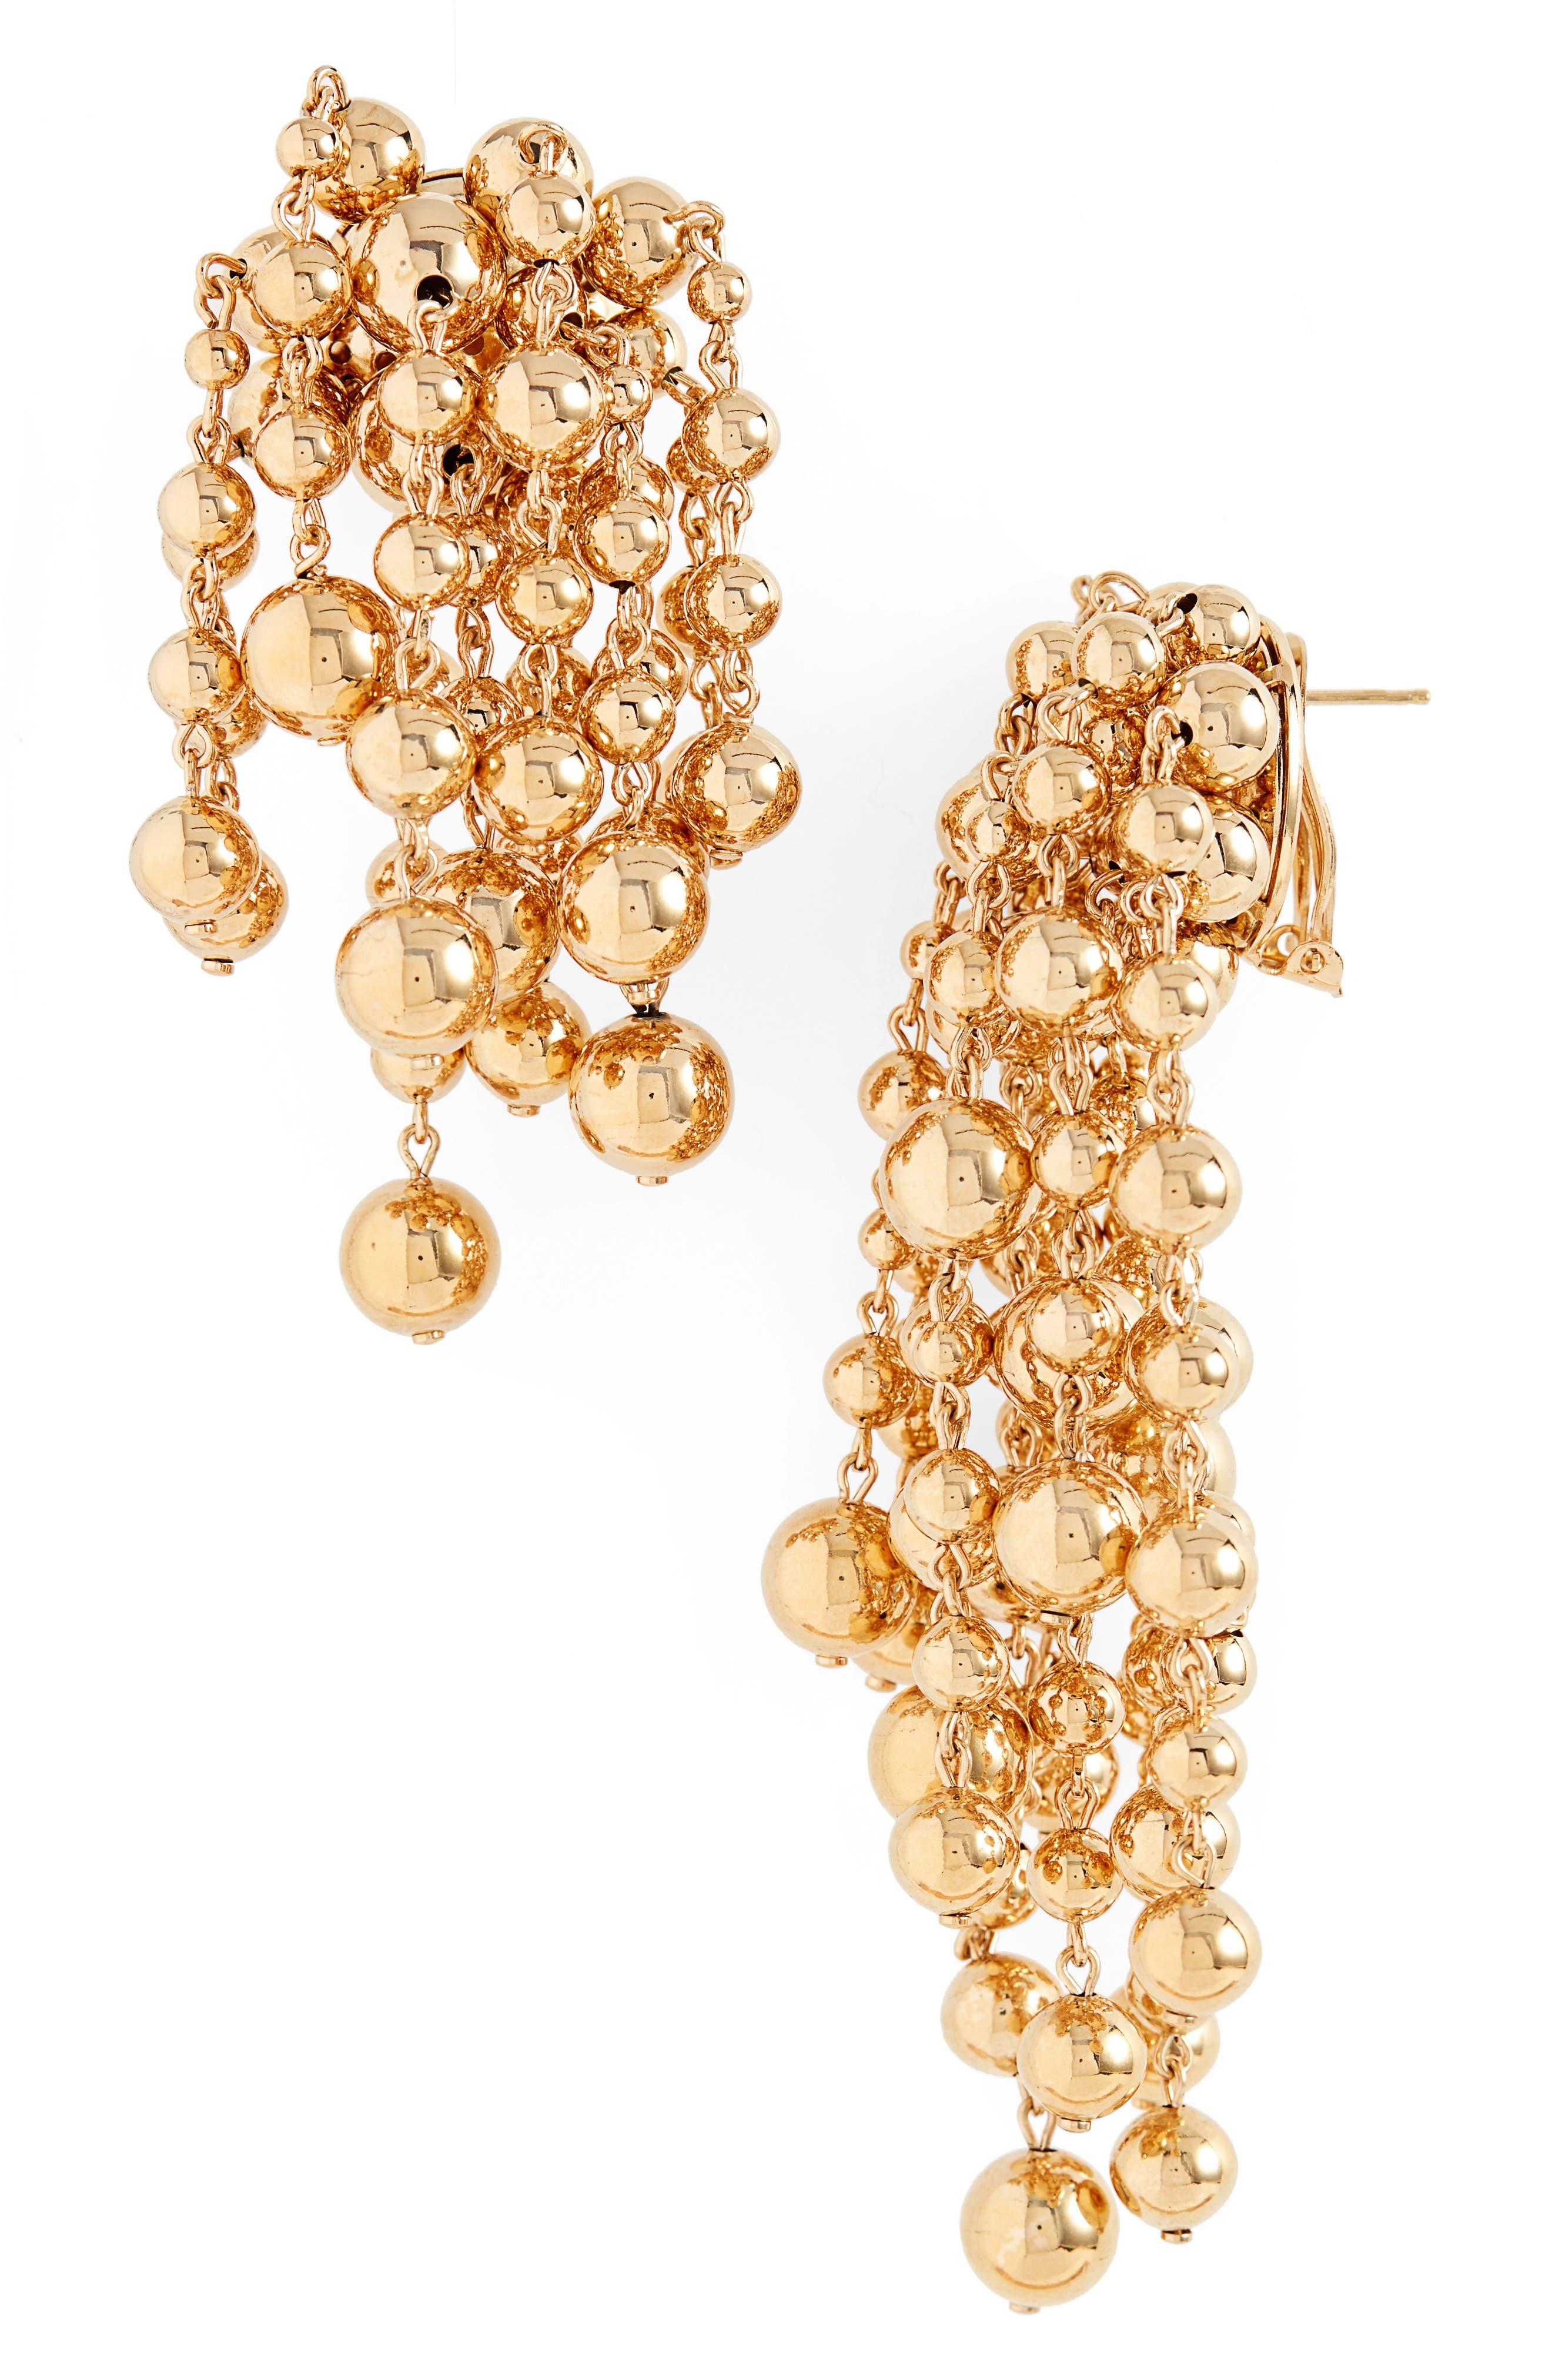 Yasmin Mismatched Earrings,                             Main thumbnail 1, color,                             GOLD